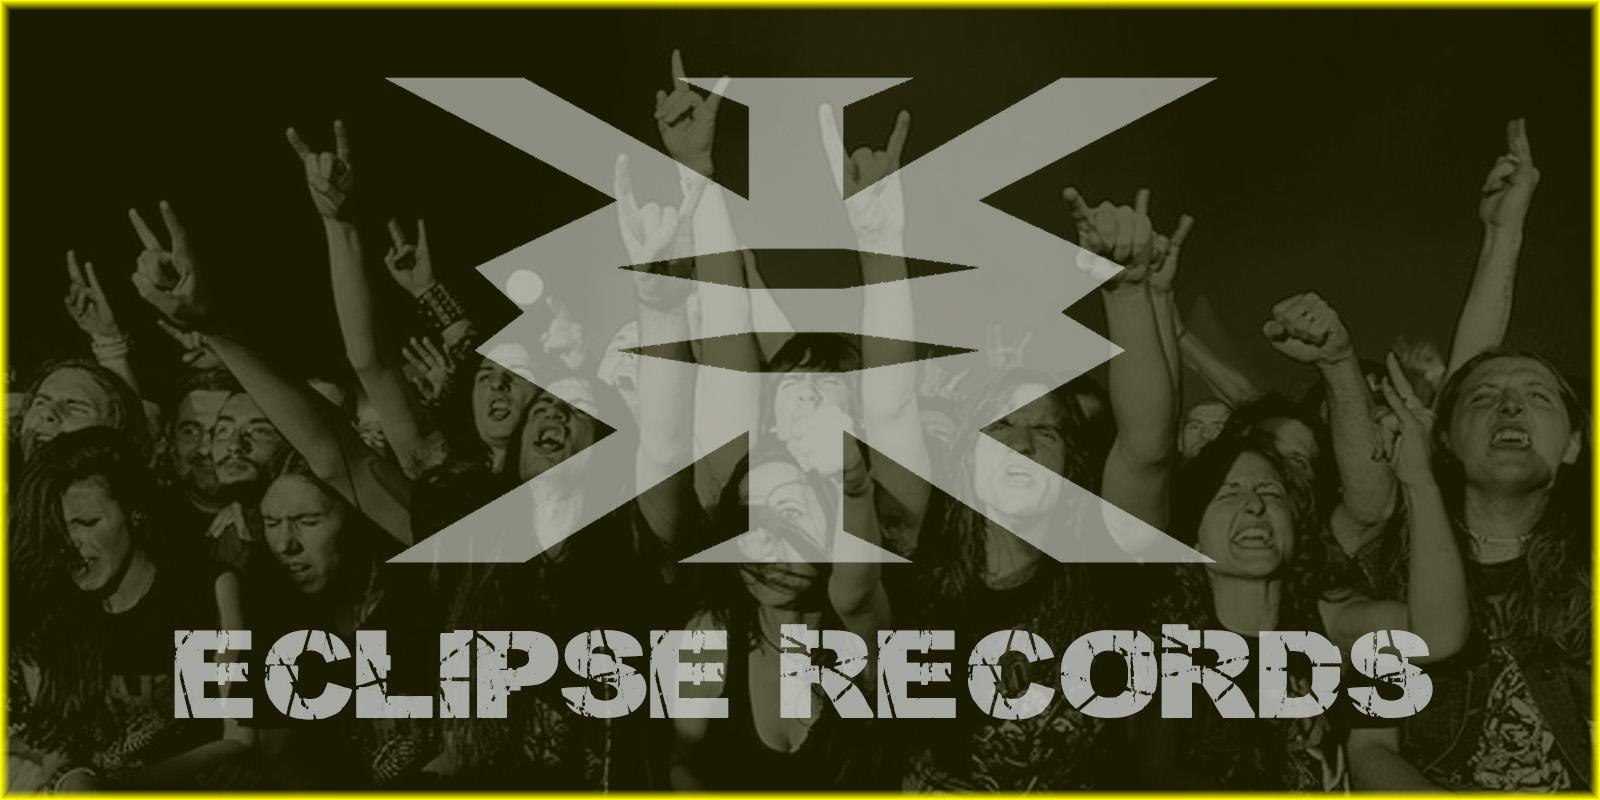 Eclipse Records - heavy metal record label